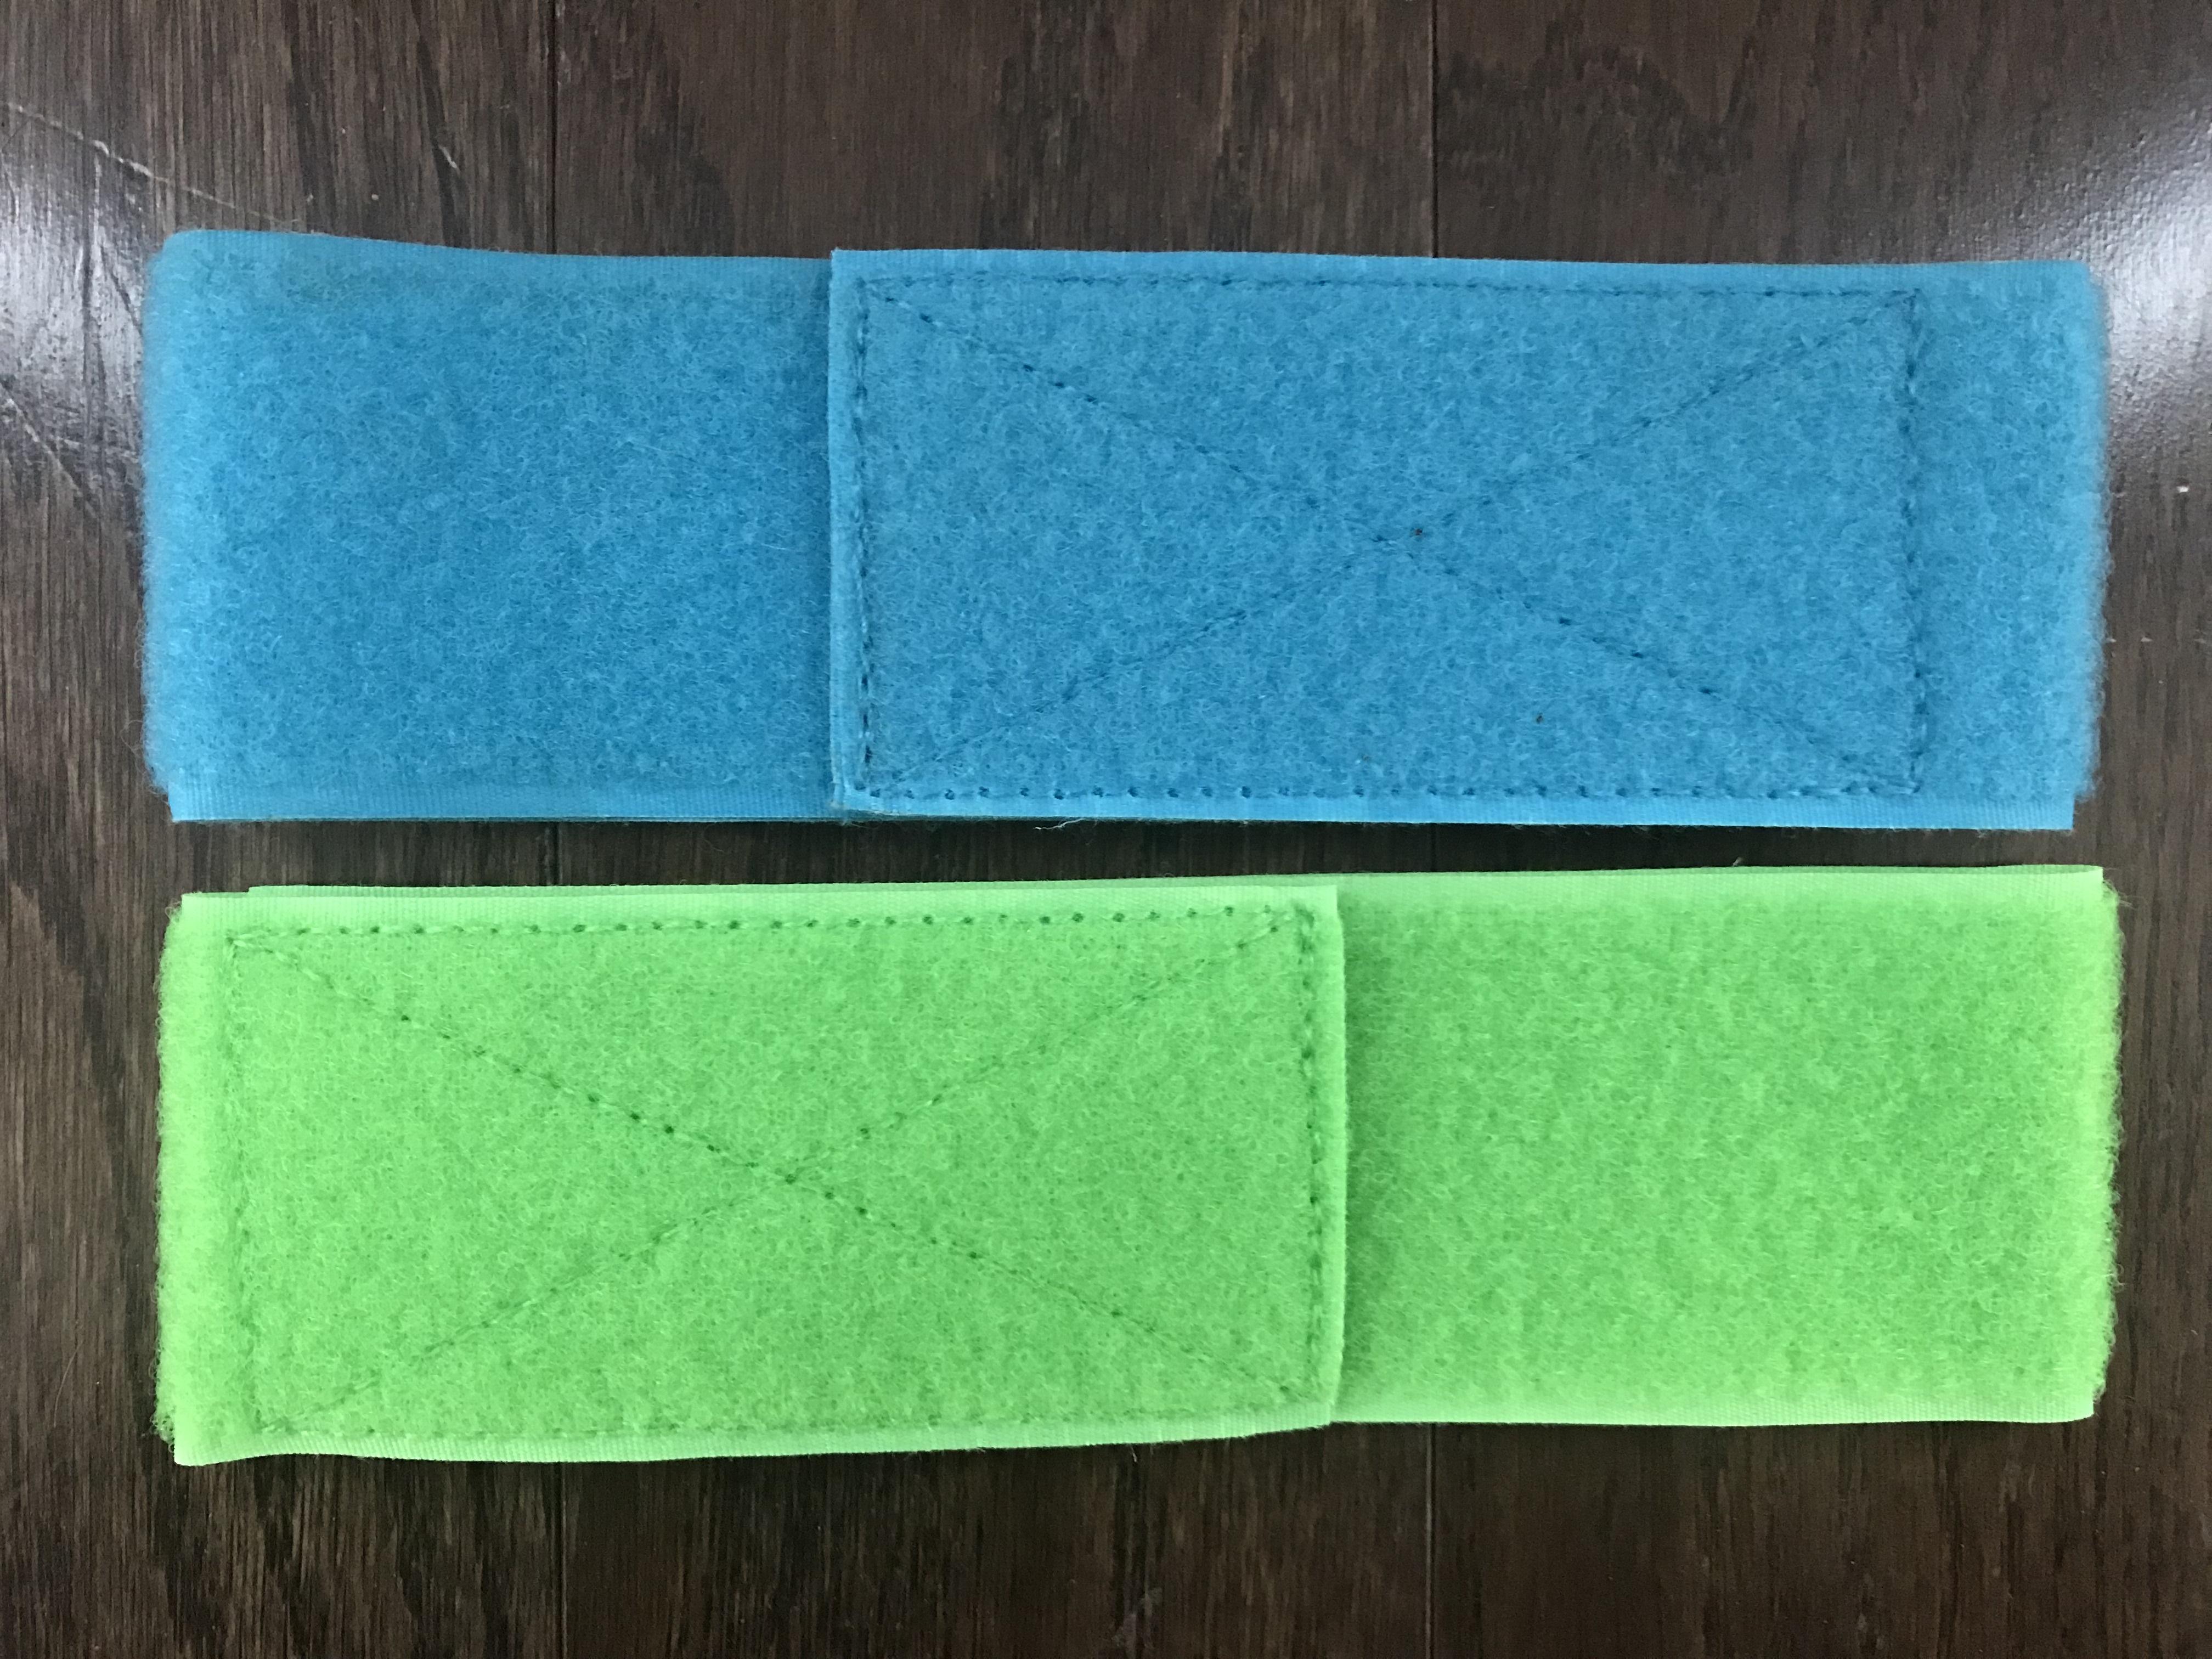 Two Reusable Armbands